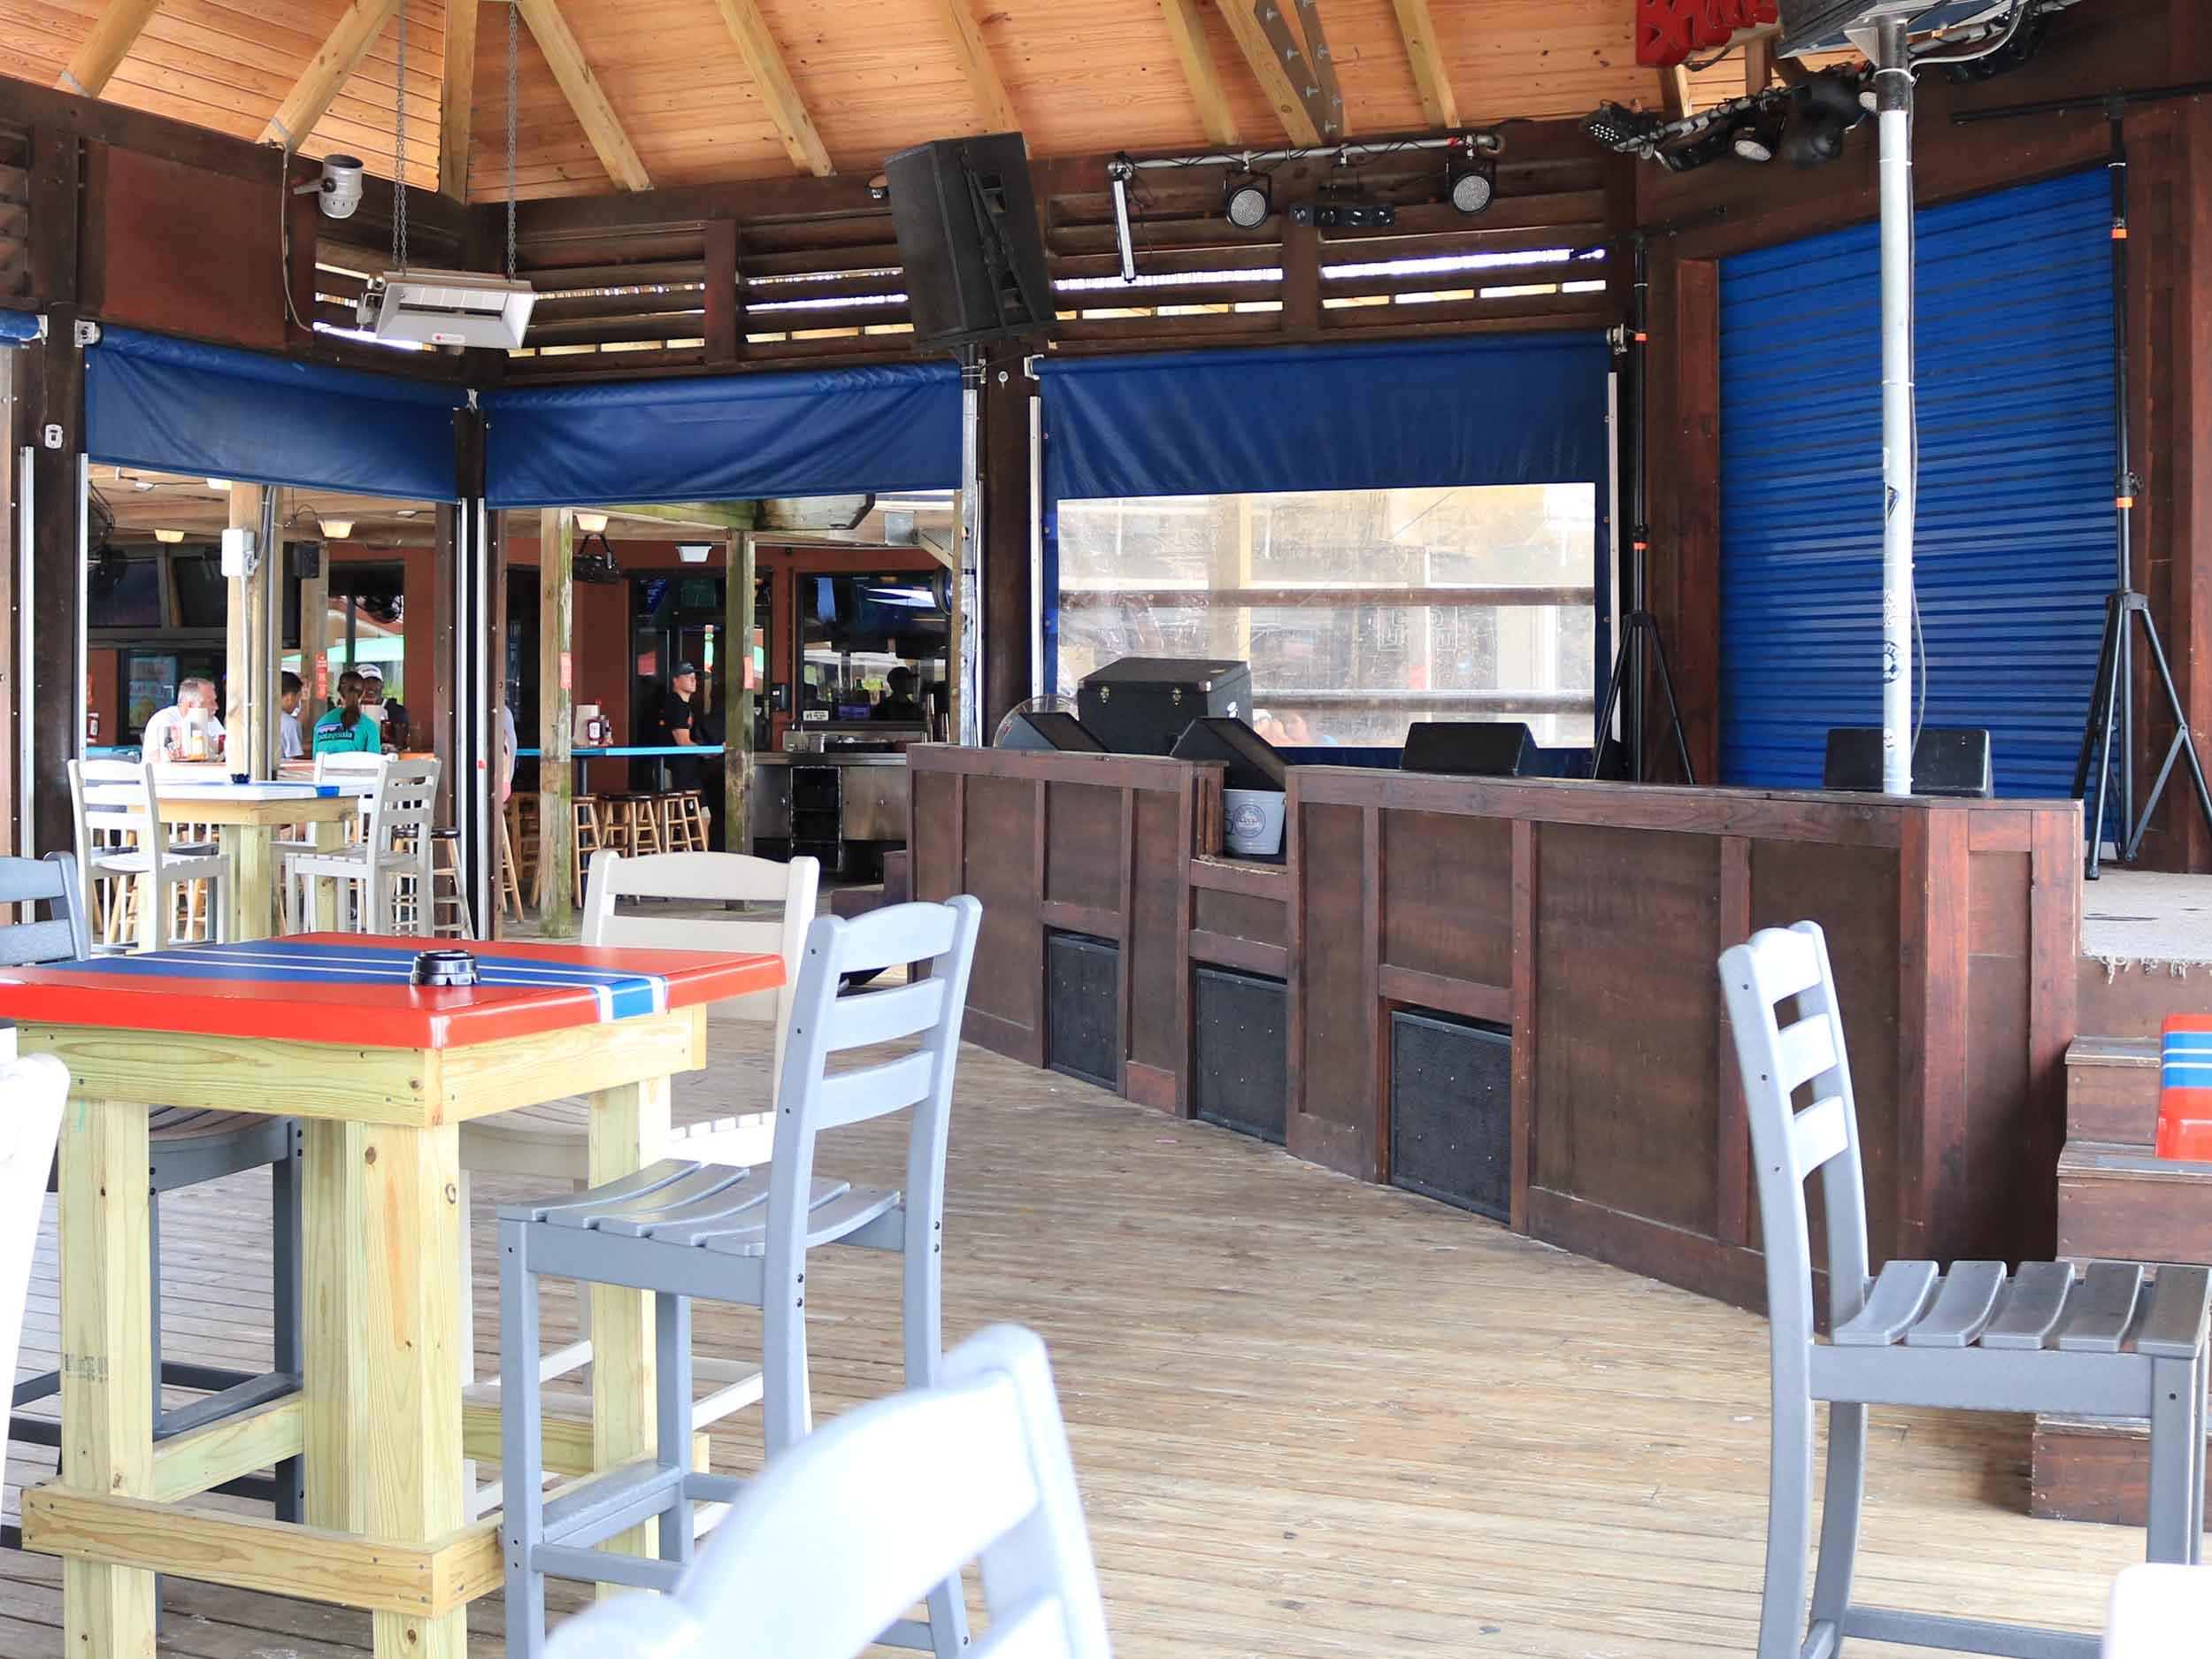 Bamboo Willies Beachside Bar Stage